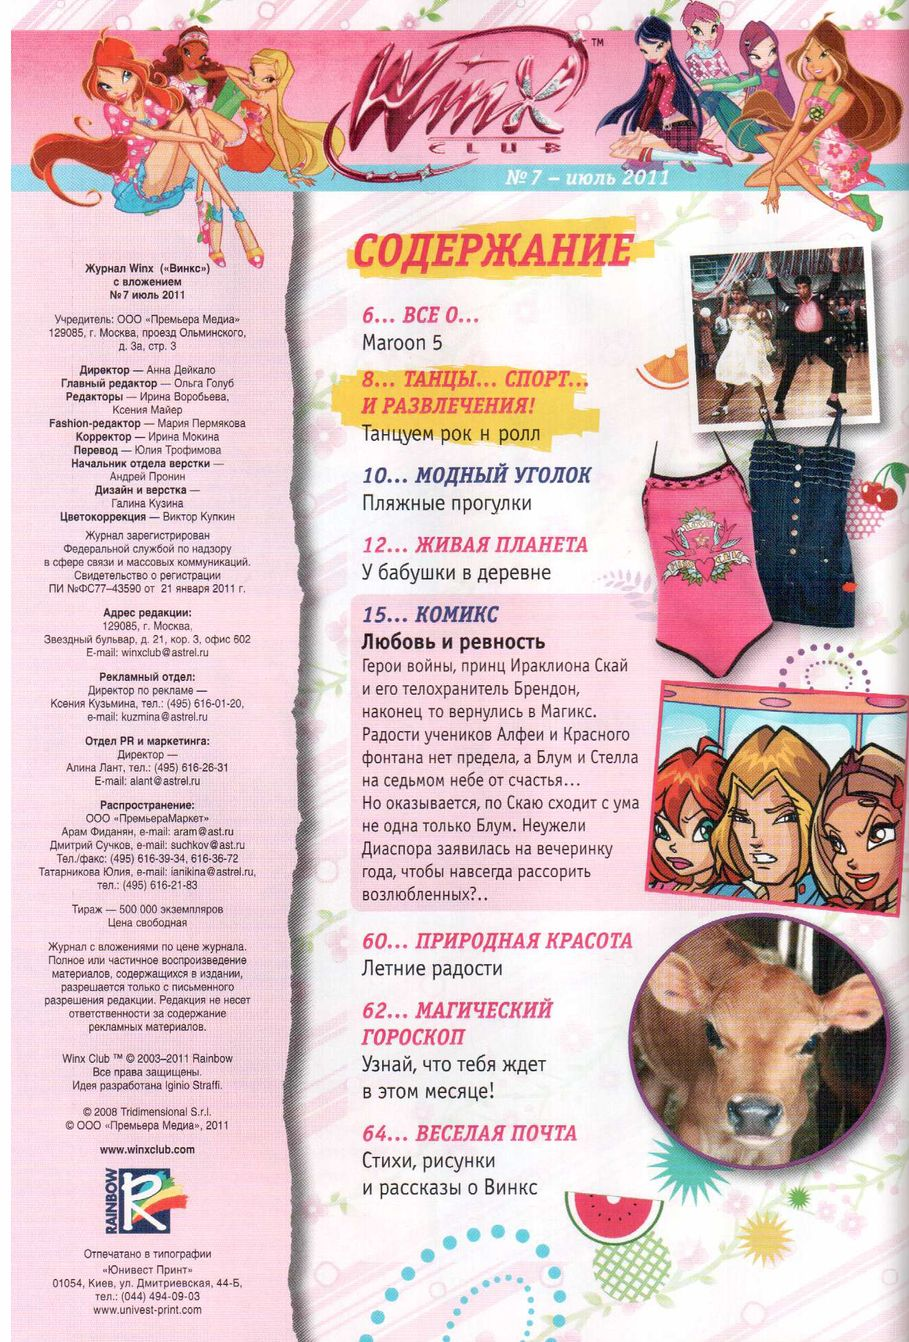 Комикс Винкс Winx - Любовь и ревность (Журнал Винкс №7 2011) - стр. 4